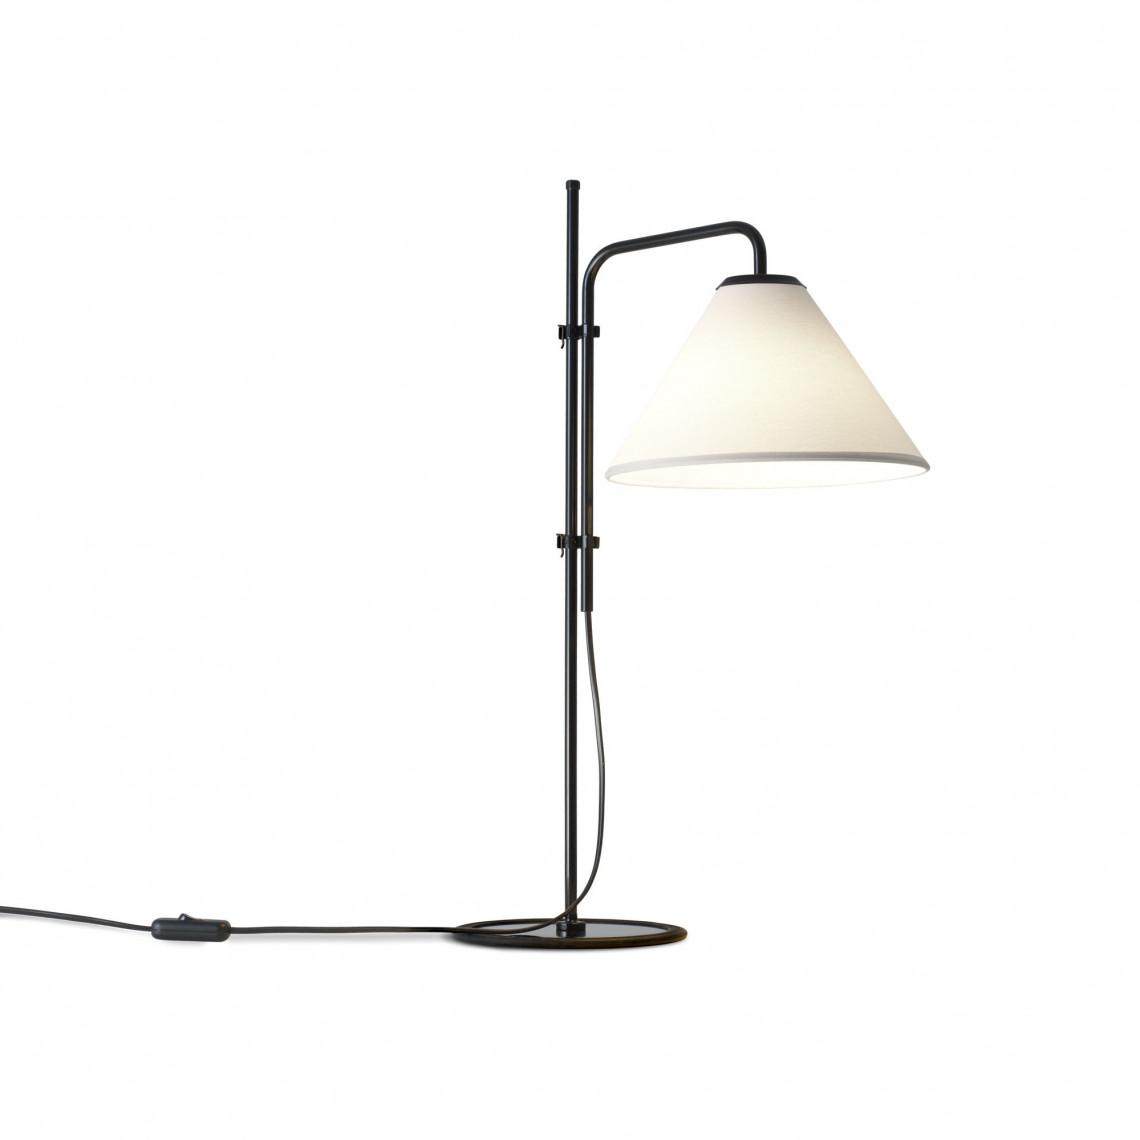 Funiculi S Fabric - Table Lamp Black/White